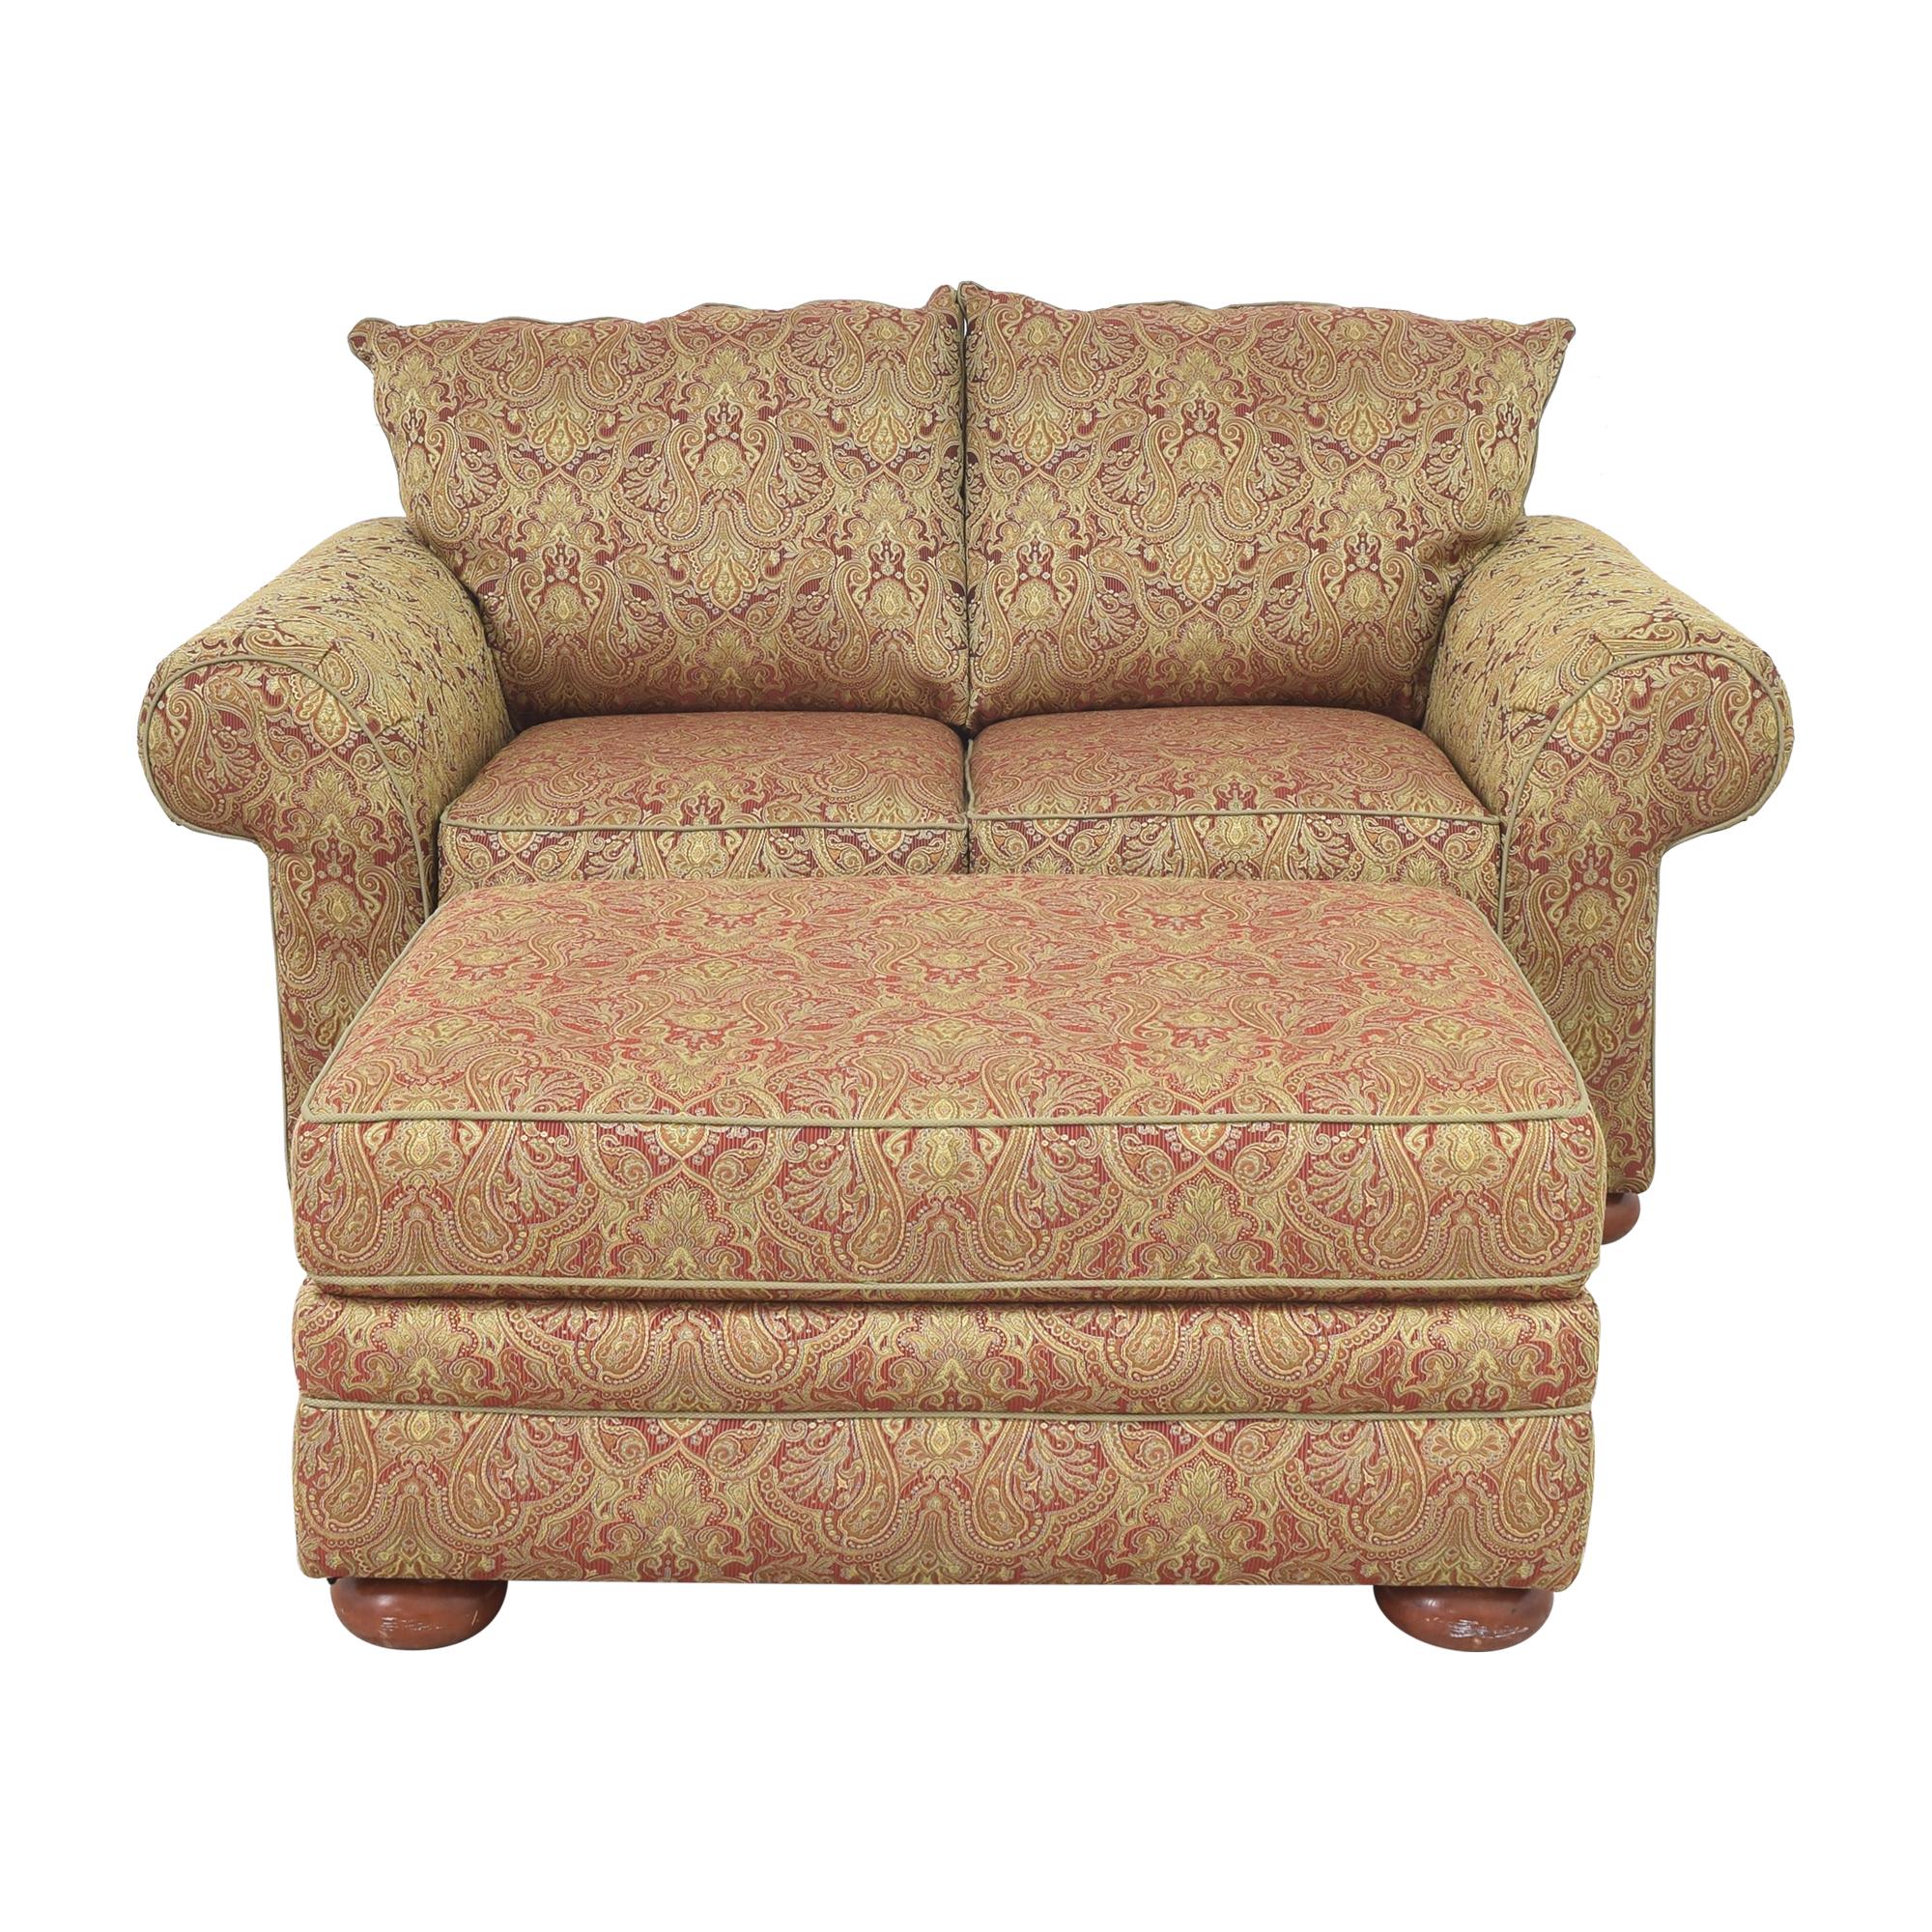 Bassett Furniture Bassett Furniture Roll Arm Loveseat with Ottoman Sofas